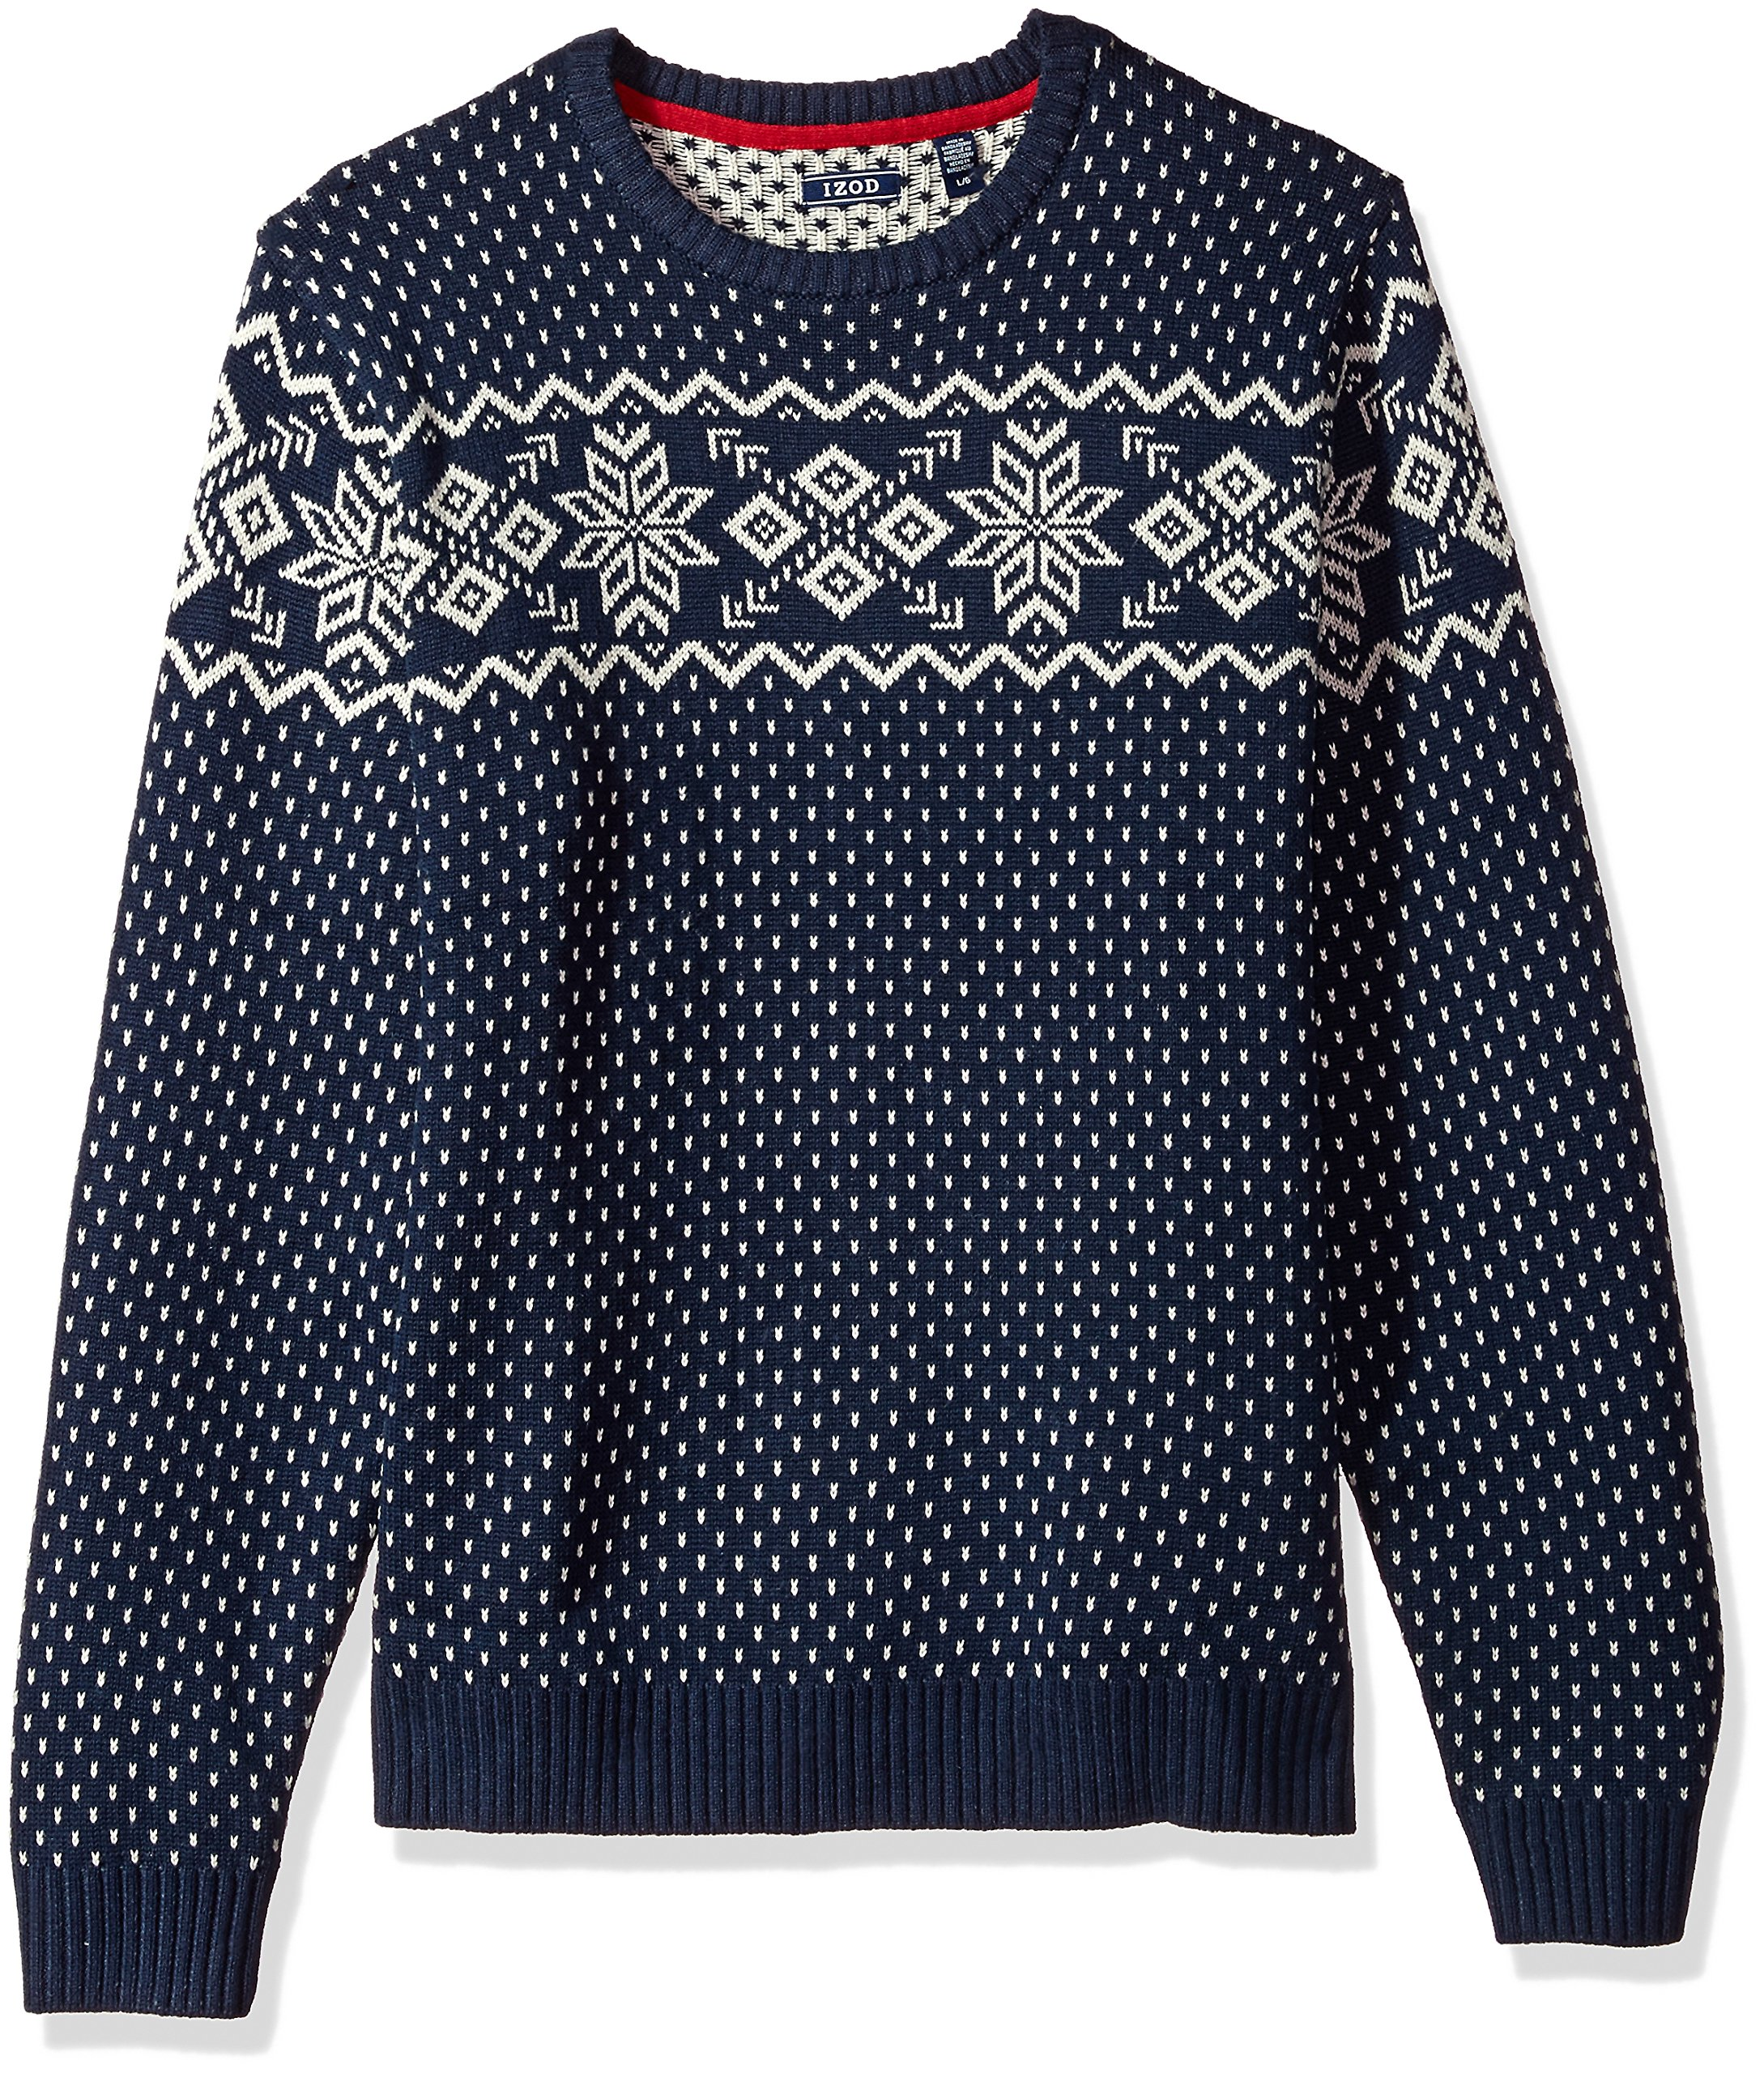 IZOD Men's Fine Gauge Crew Sweater, Peacoat, Large